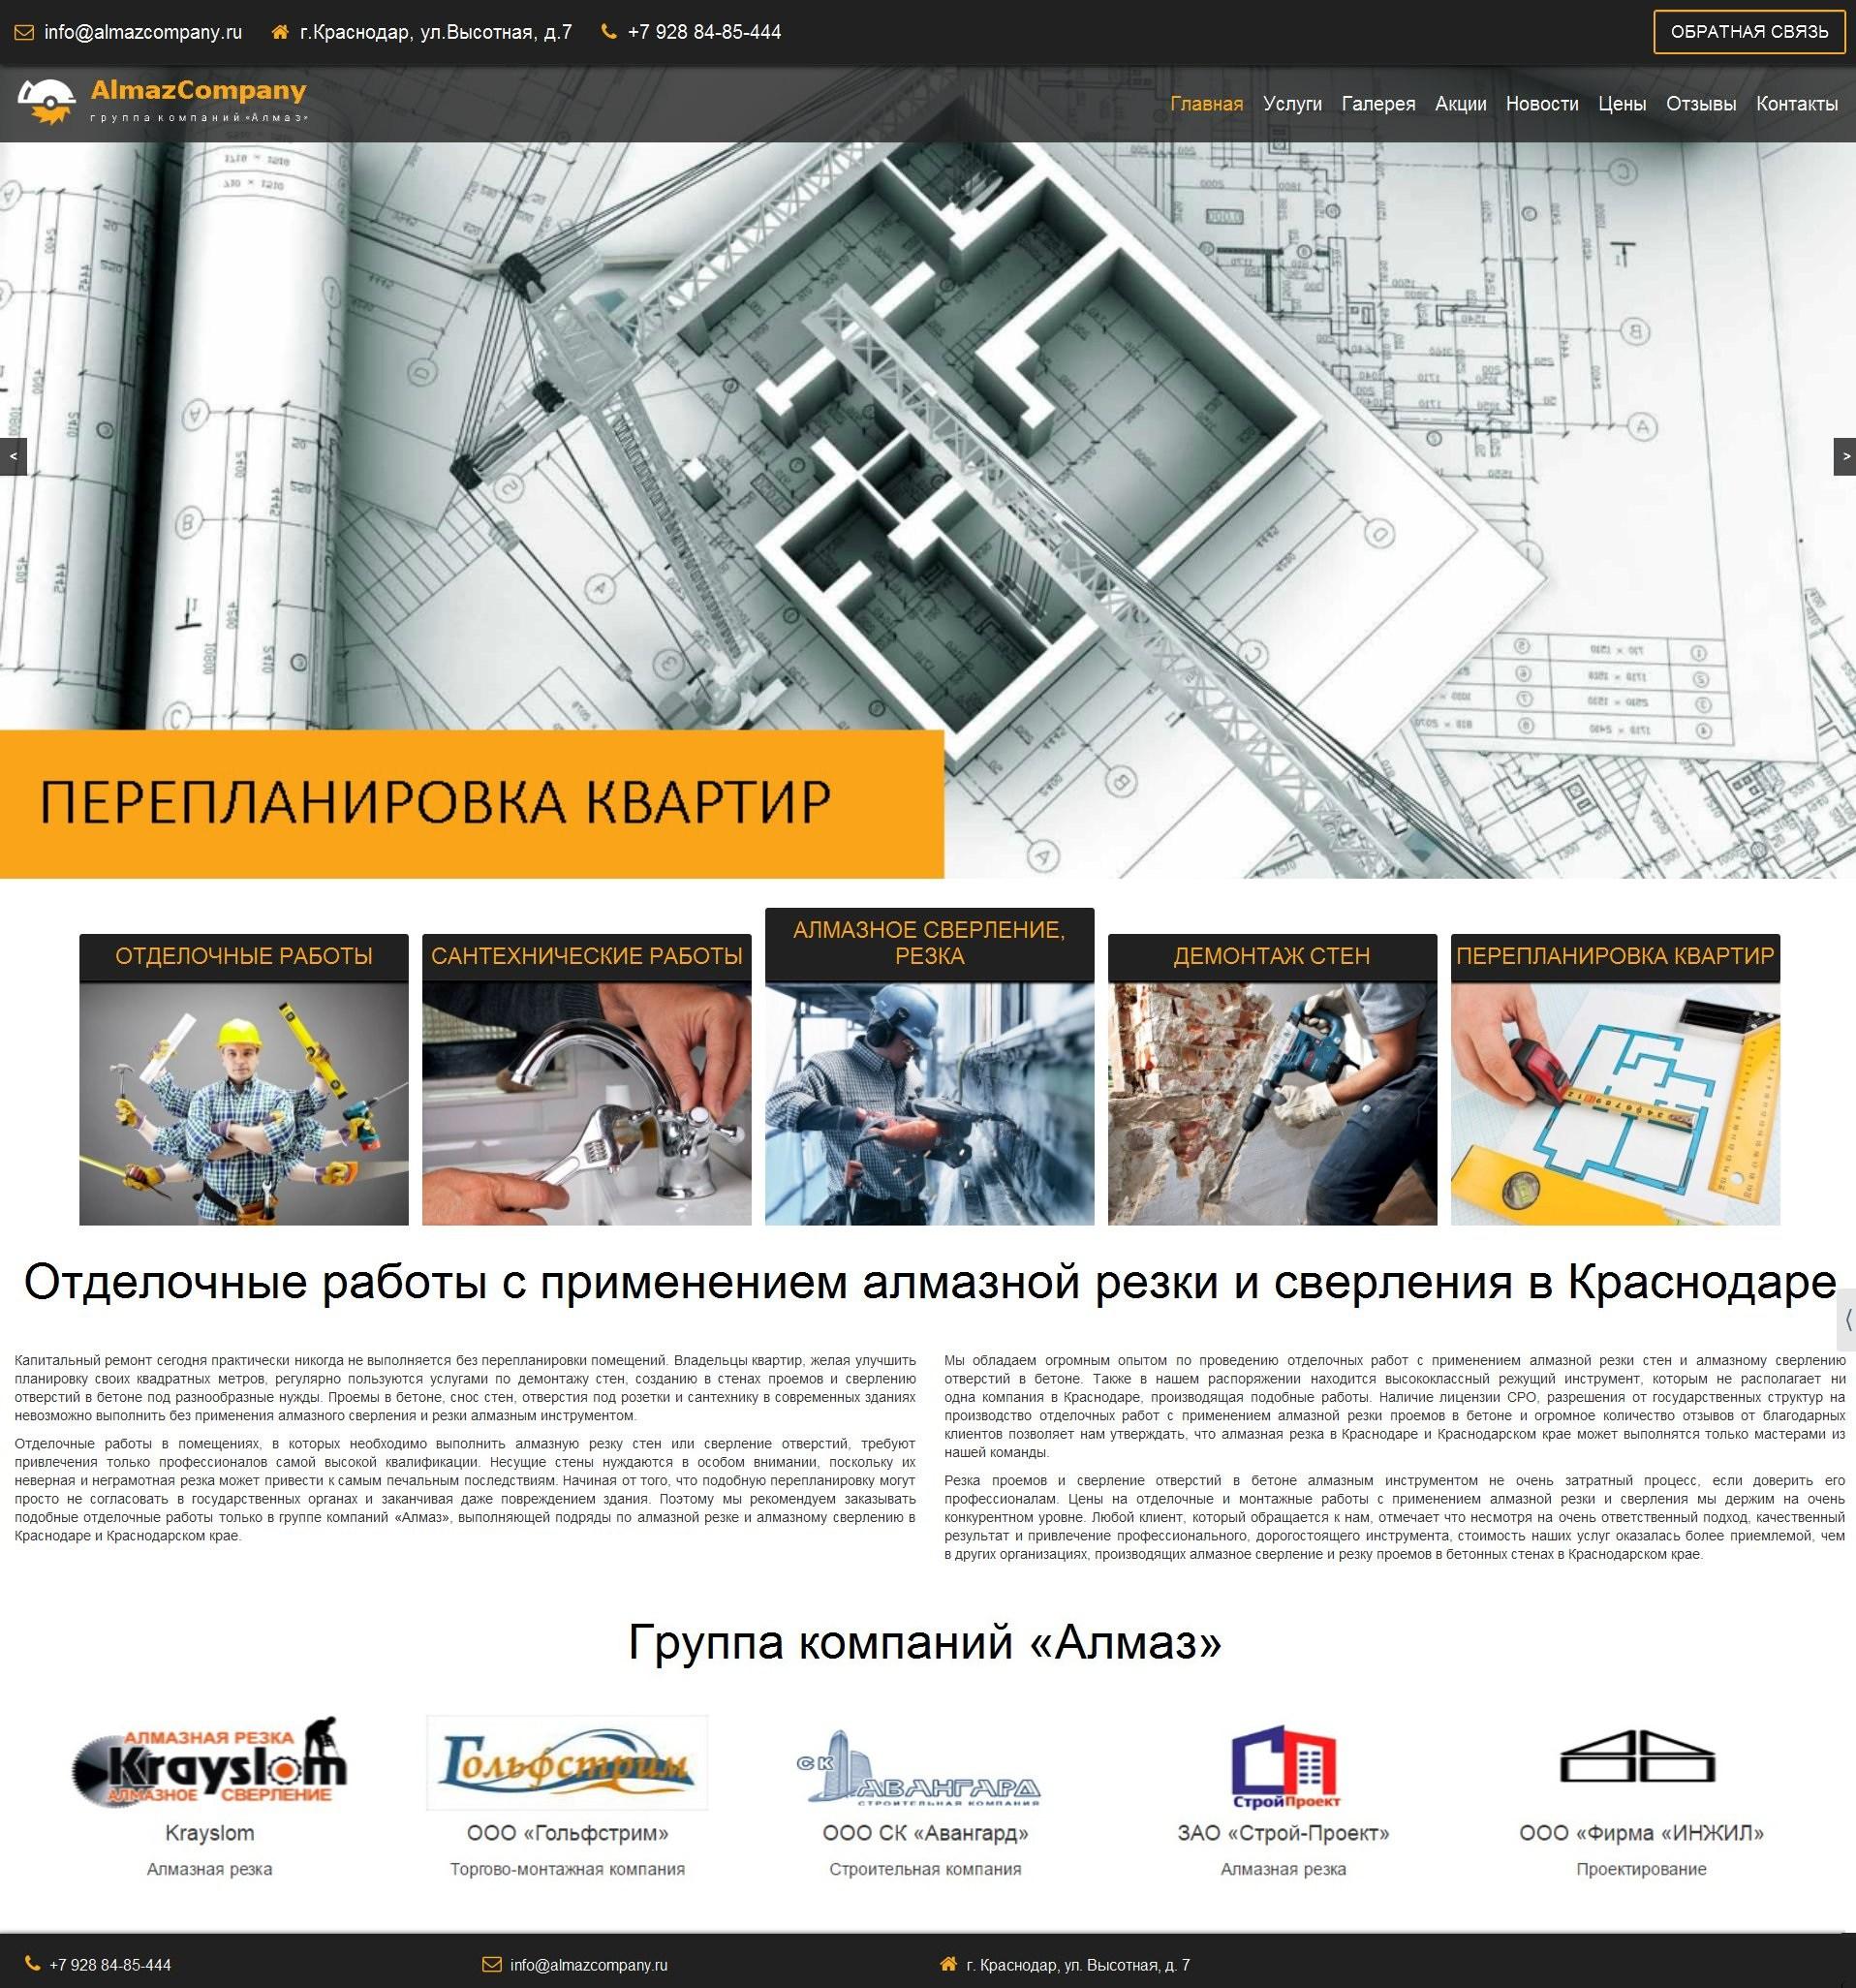 AlmazCompany.ru